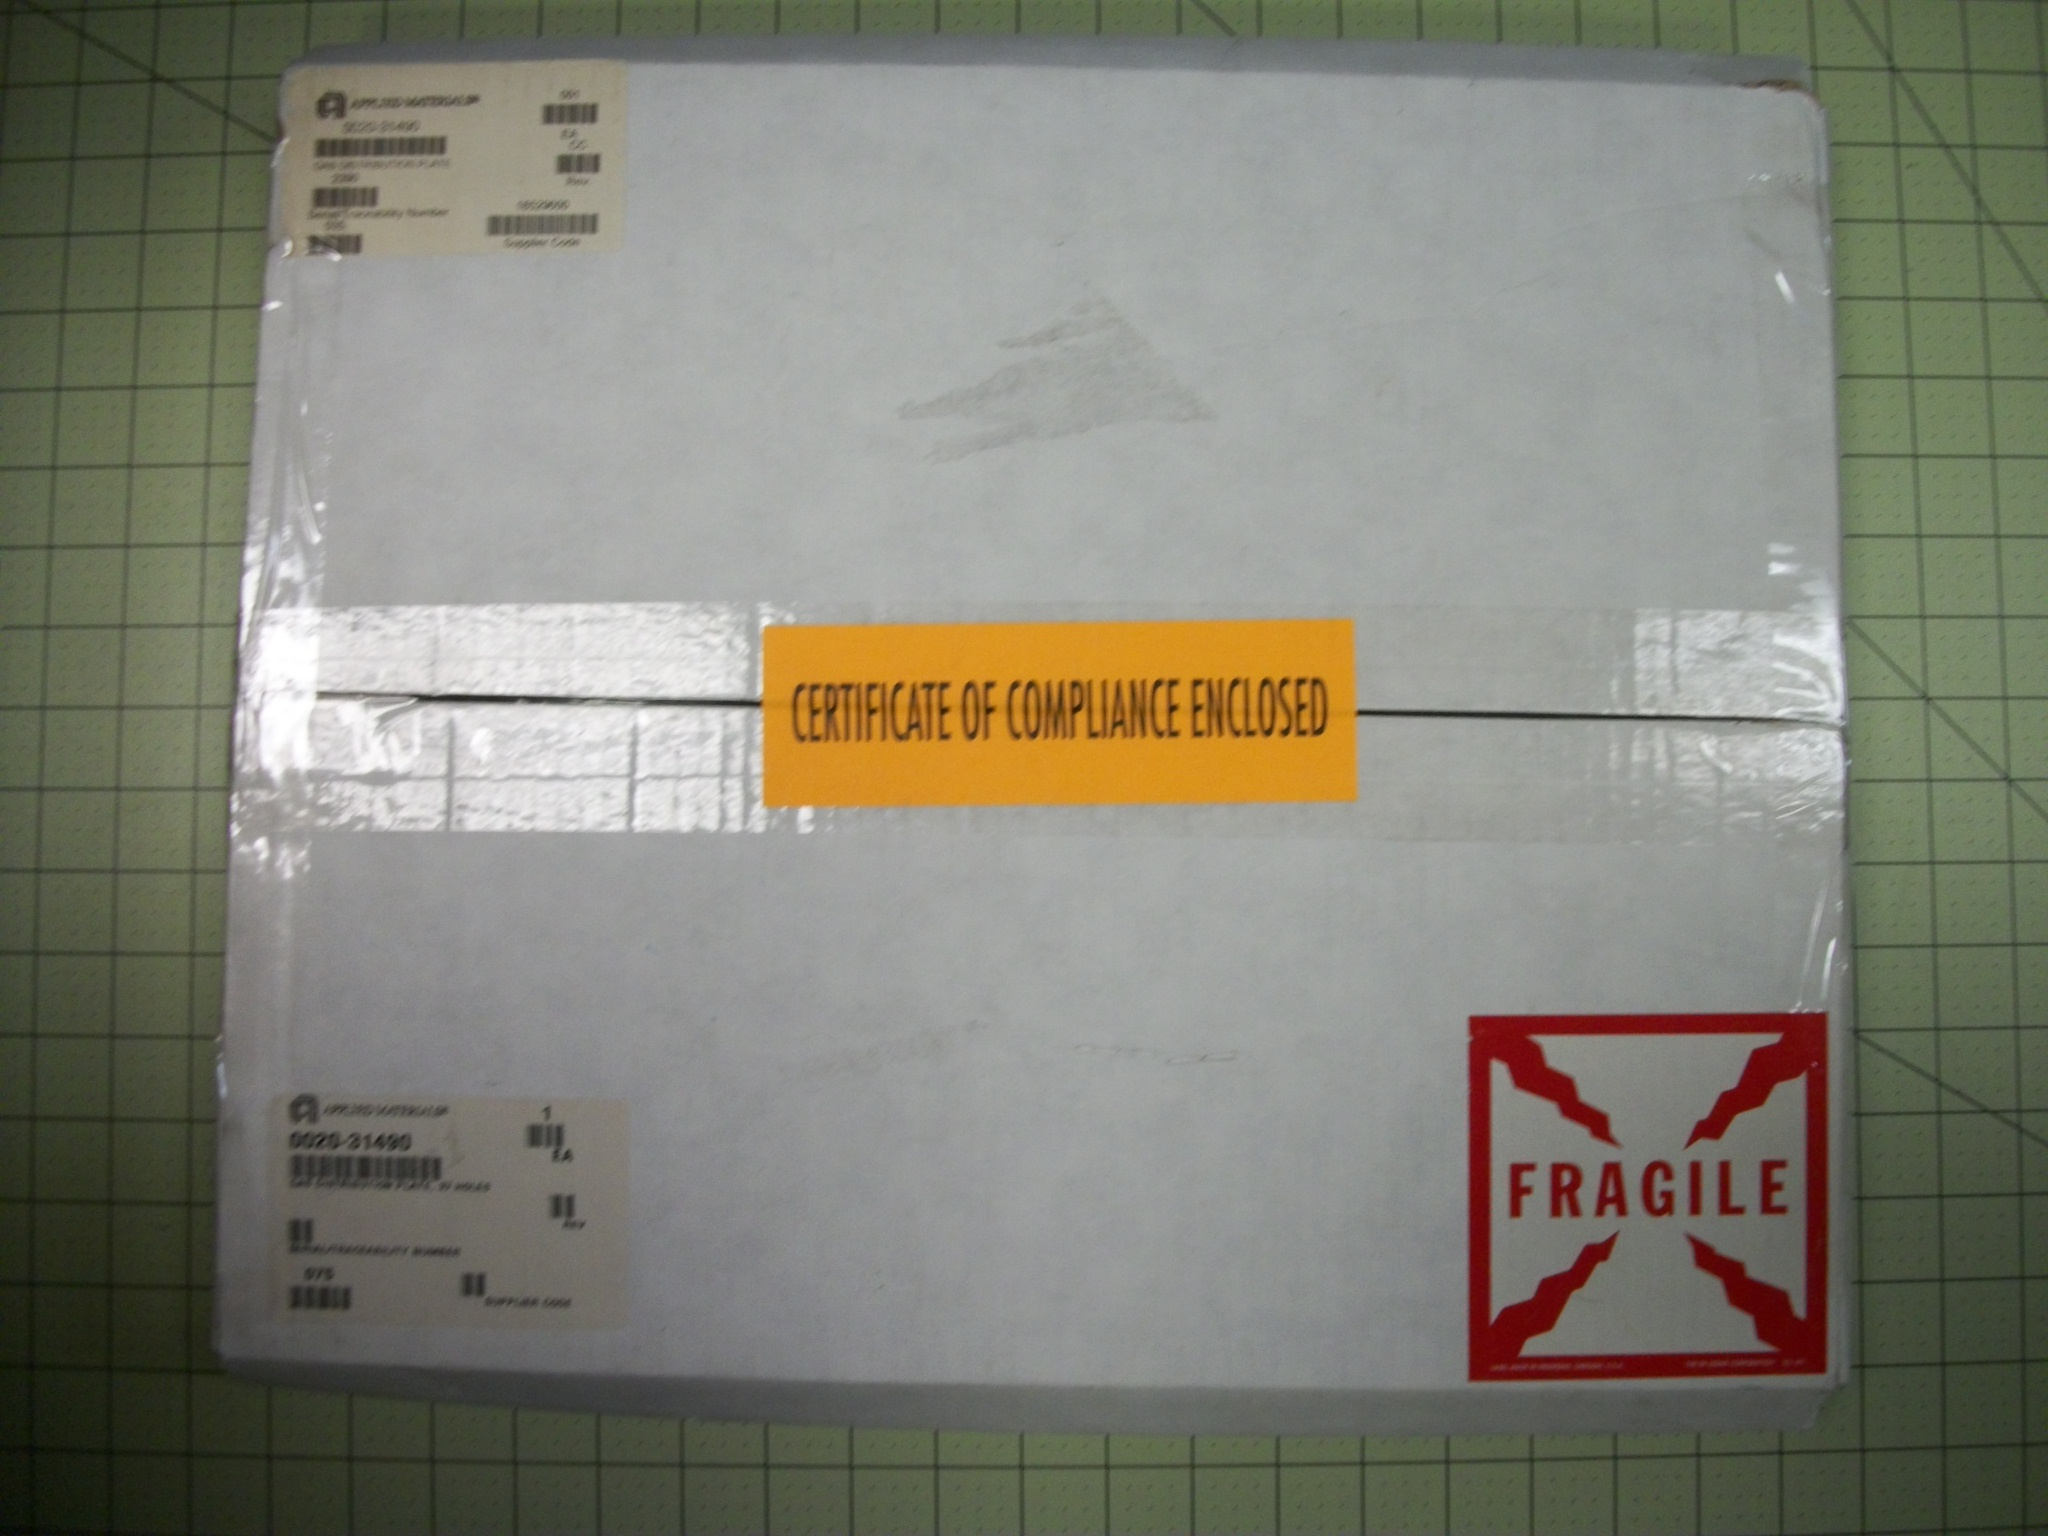 Gas distribution plate